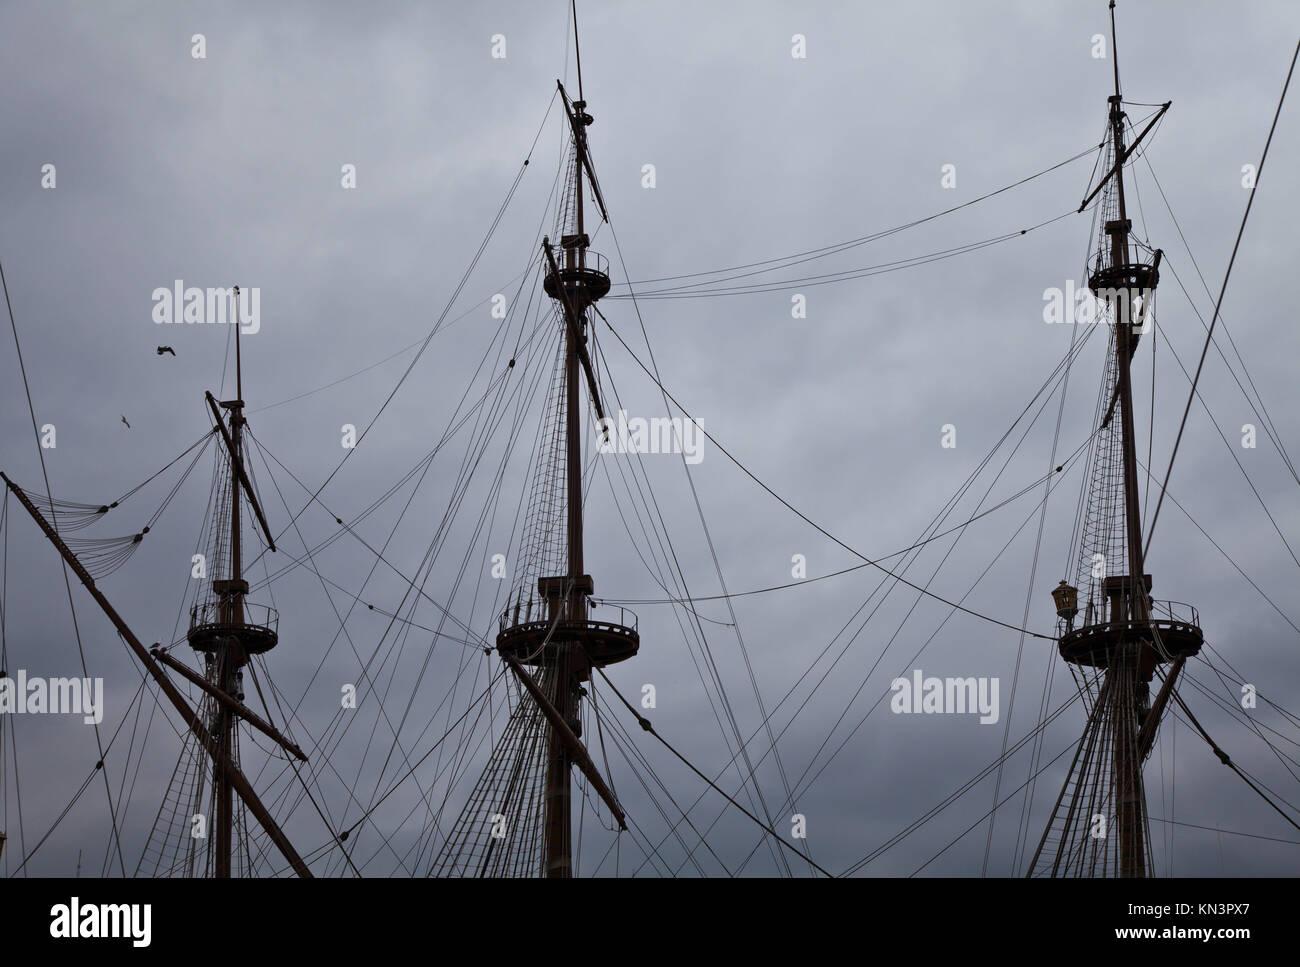 9f2e96426cb Pirate Galleon Stock Photos   Pirate Galleon Stock Images - Alamy